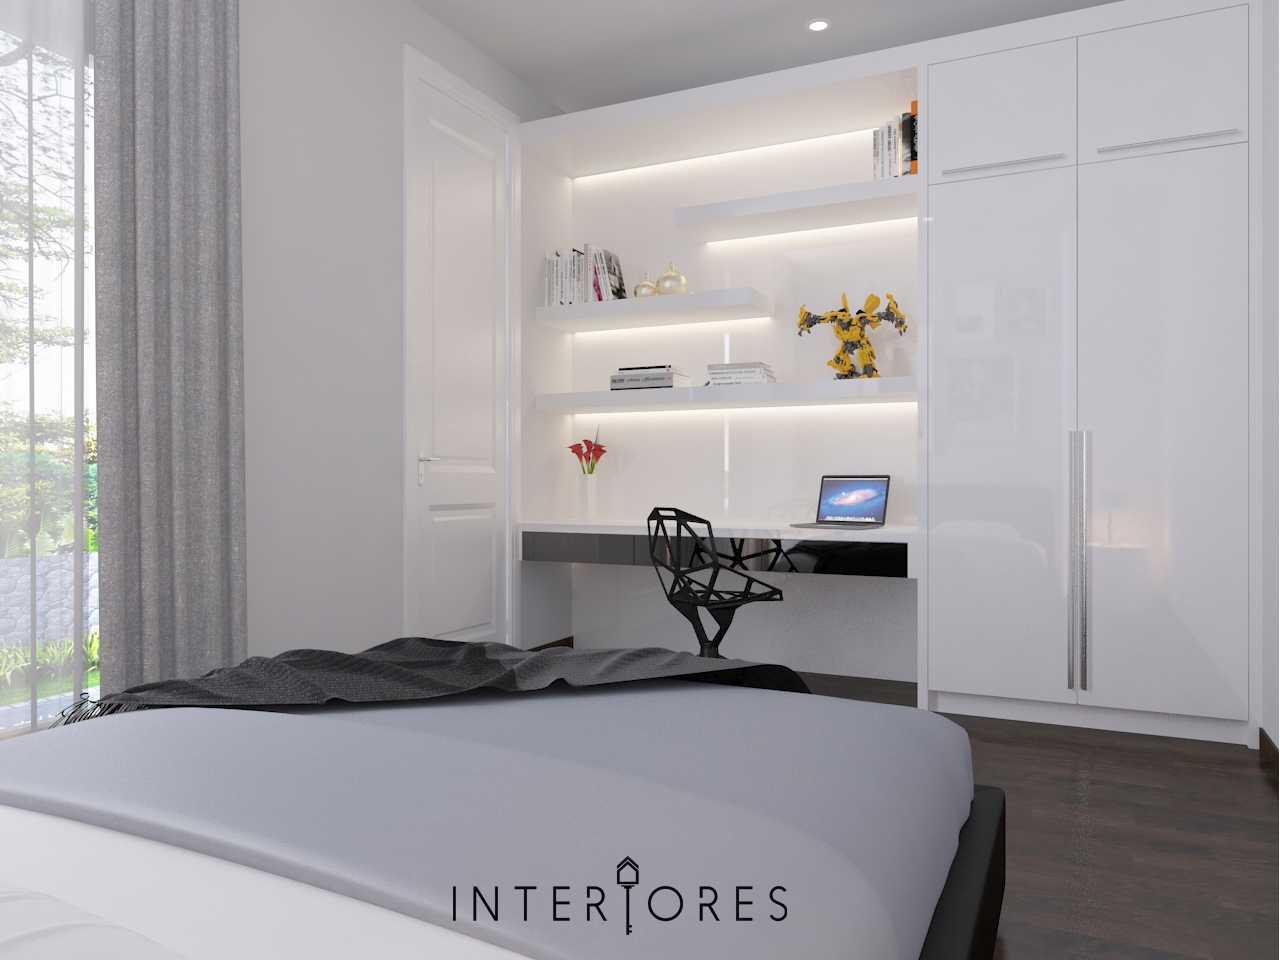 Interiores Interior Consultant & Build Sutera Onyx Alam Sutera Alam Sutera Kamar-Anak-View Modern  17719